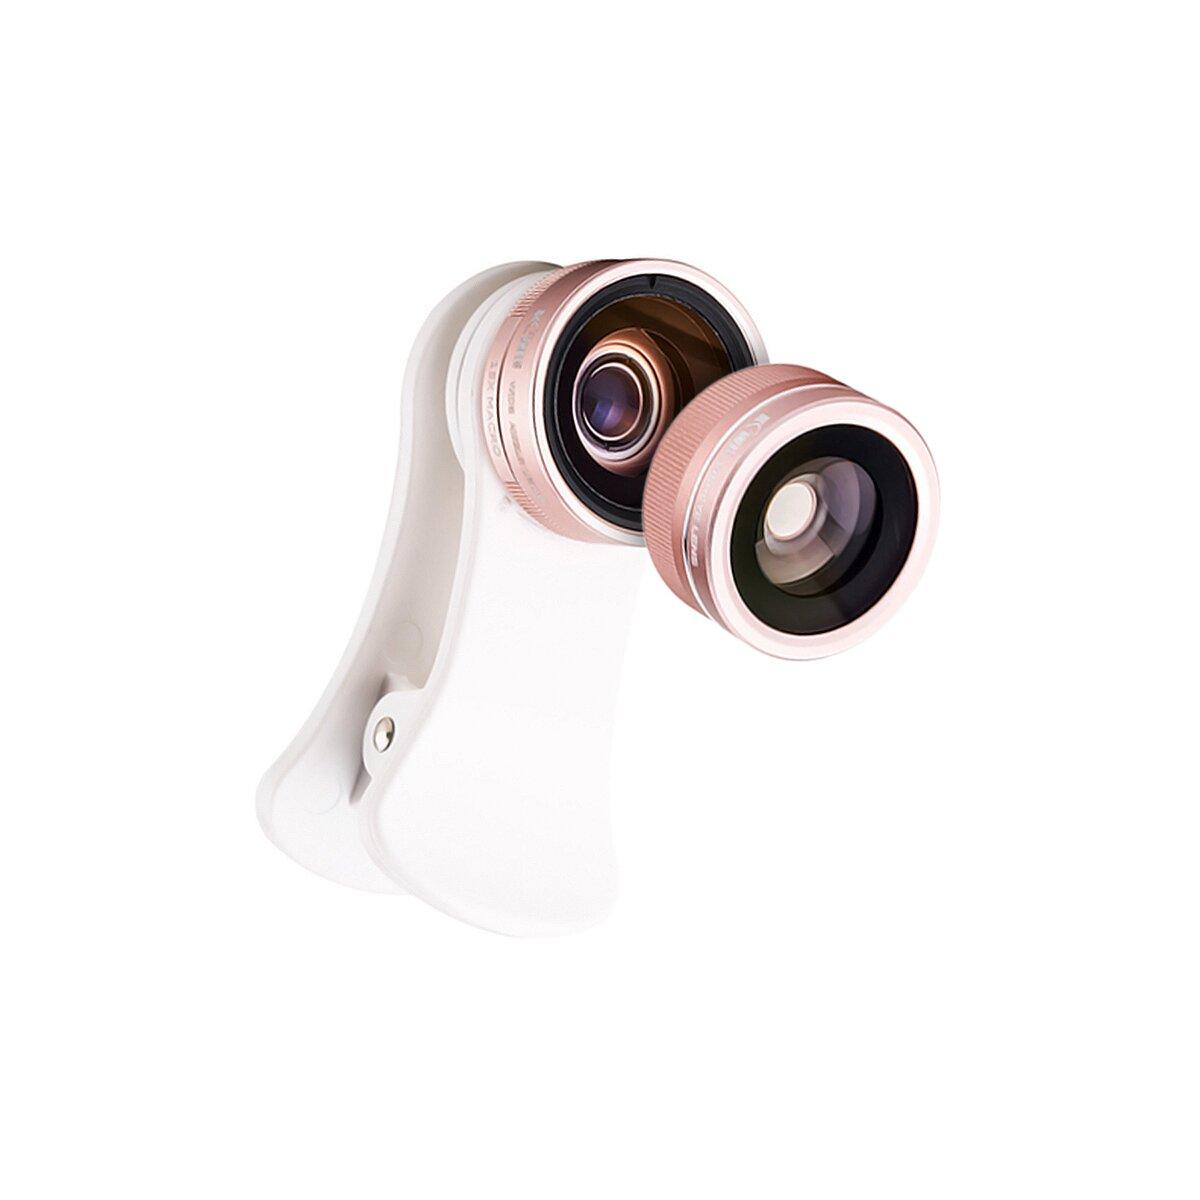 JJC Smartphone Kamera Objektiv Set, HD Linse, 105° Weitwinekl, 15X Makro Objektiv, 180° Fisheyelinse